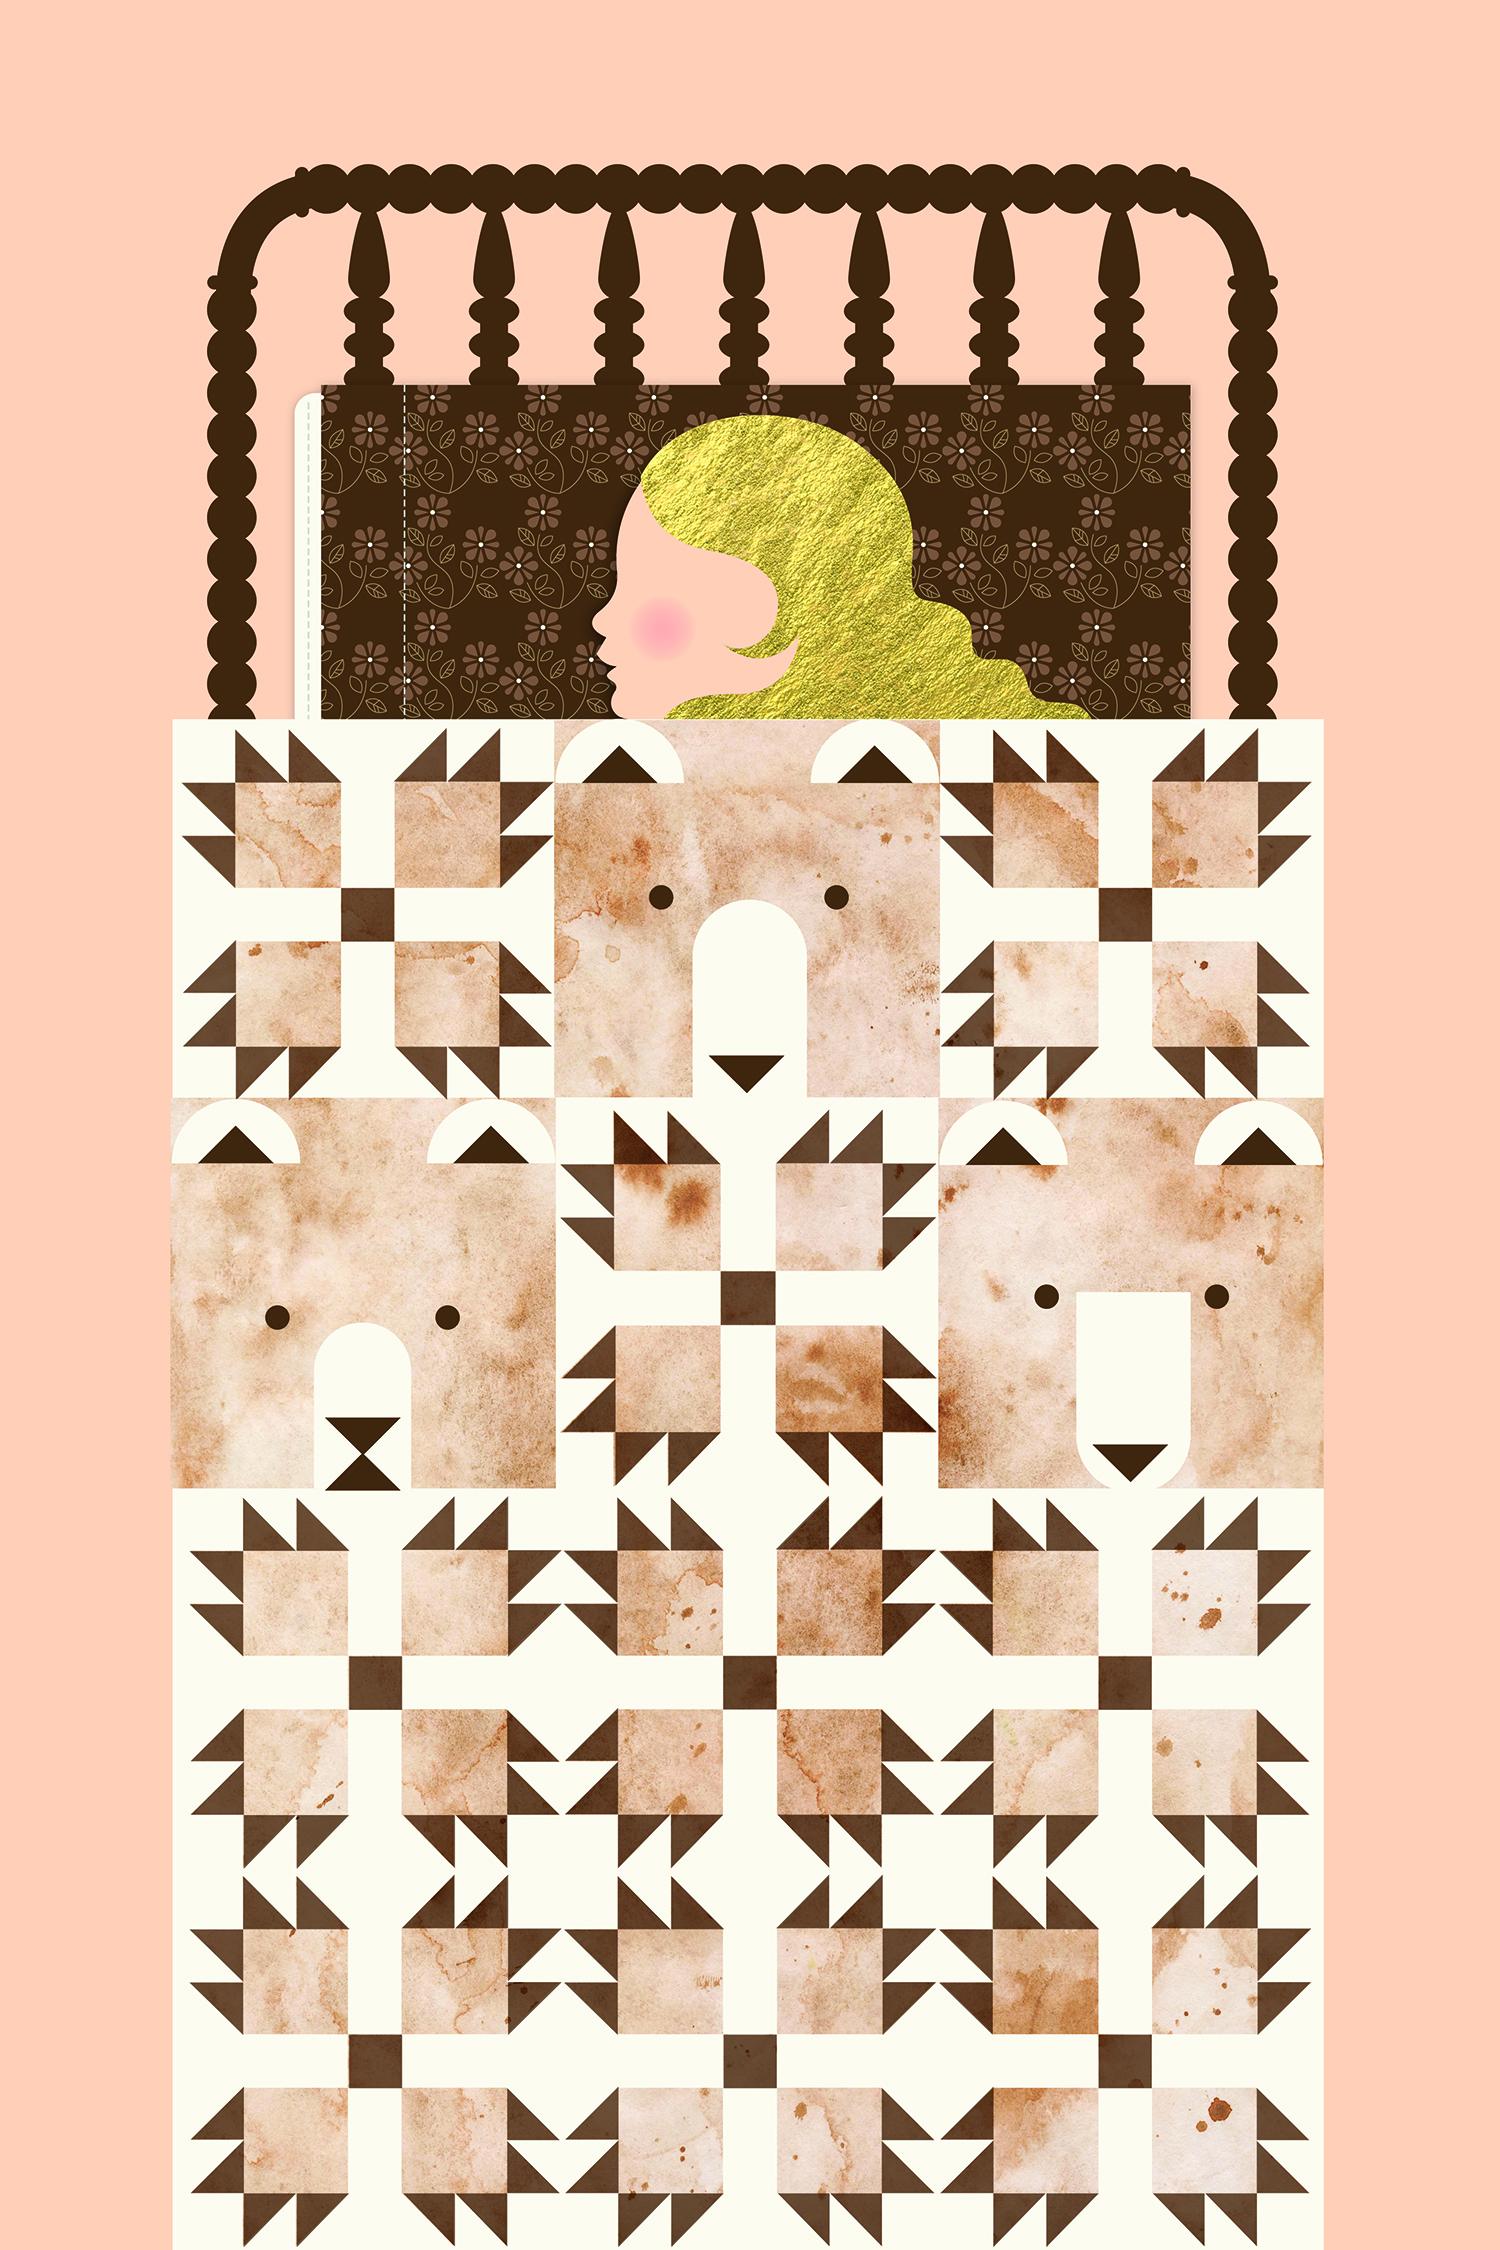 SOI 58 2015 - ARTIST: Eleanor GroschTITLE: Fairy Tale Series [1 of 6]